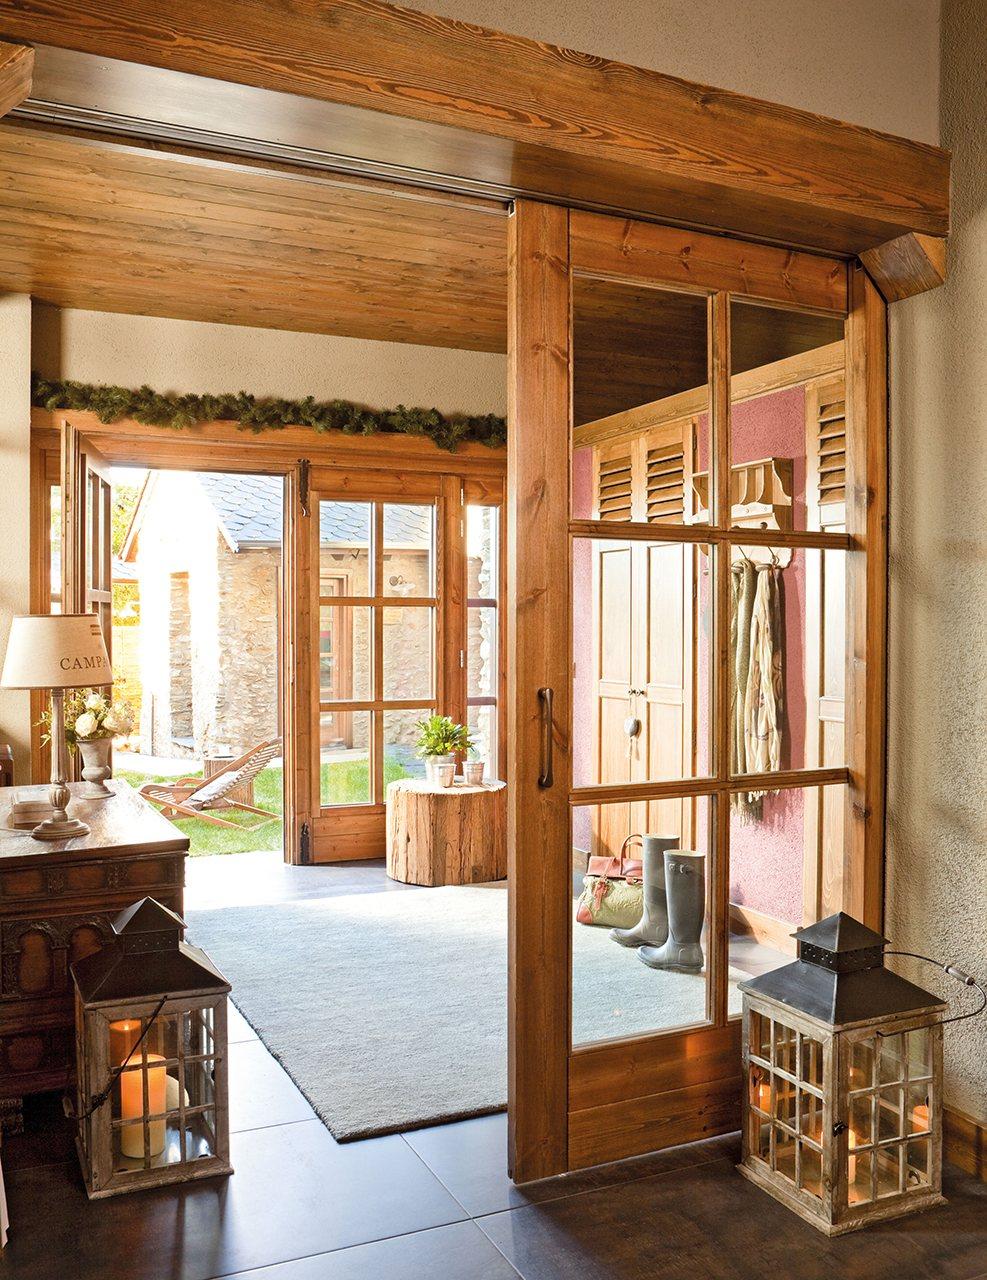 Gana espacio extra en casa for Puertas acristaladas interior